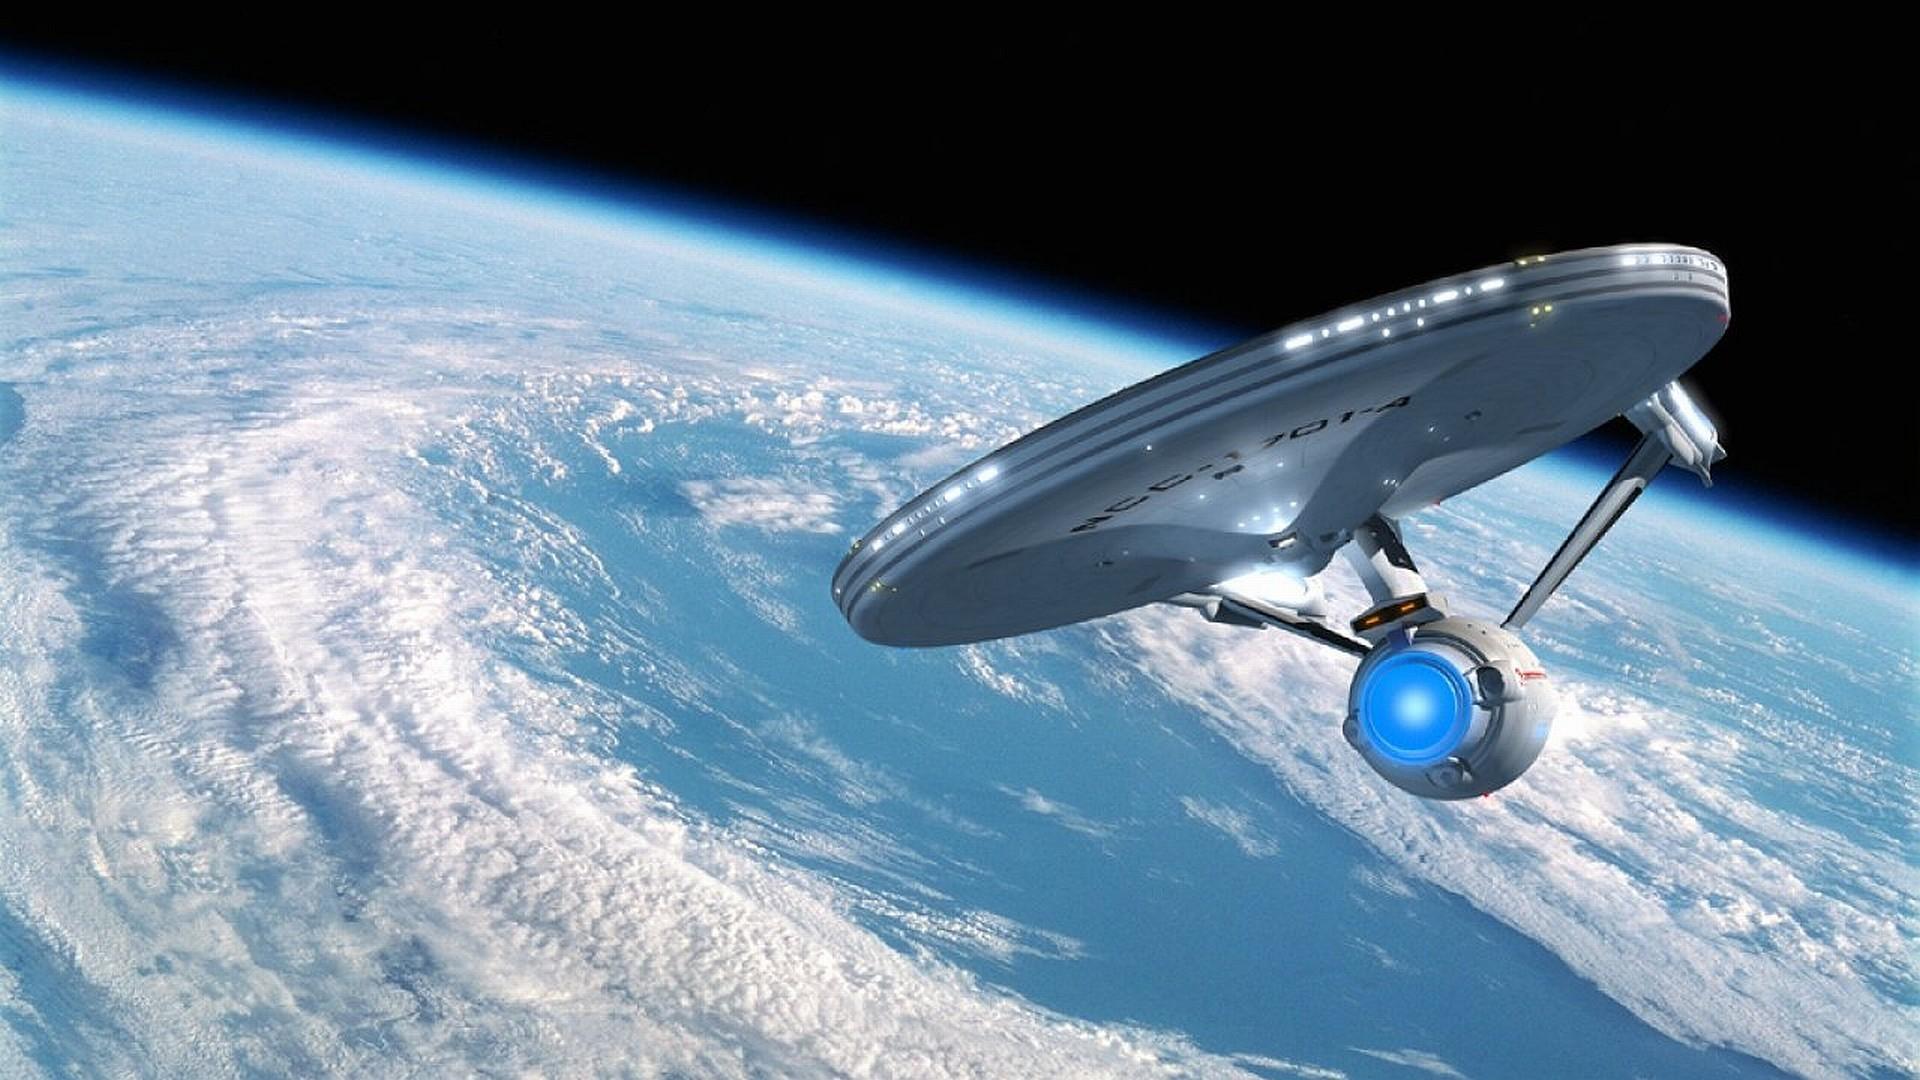 Sci Fi Star Trek Wallpaper Desktop For Desktop